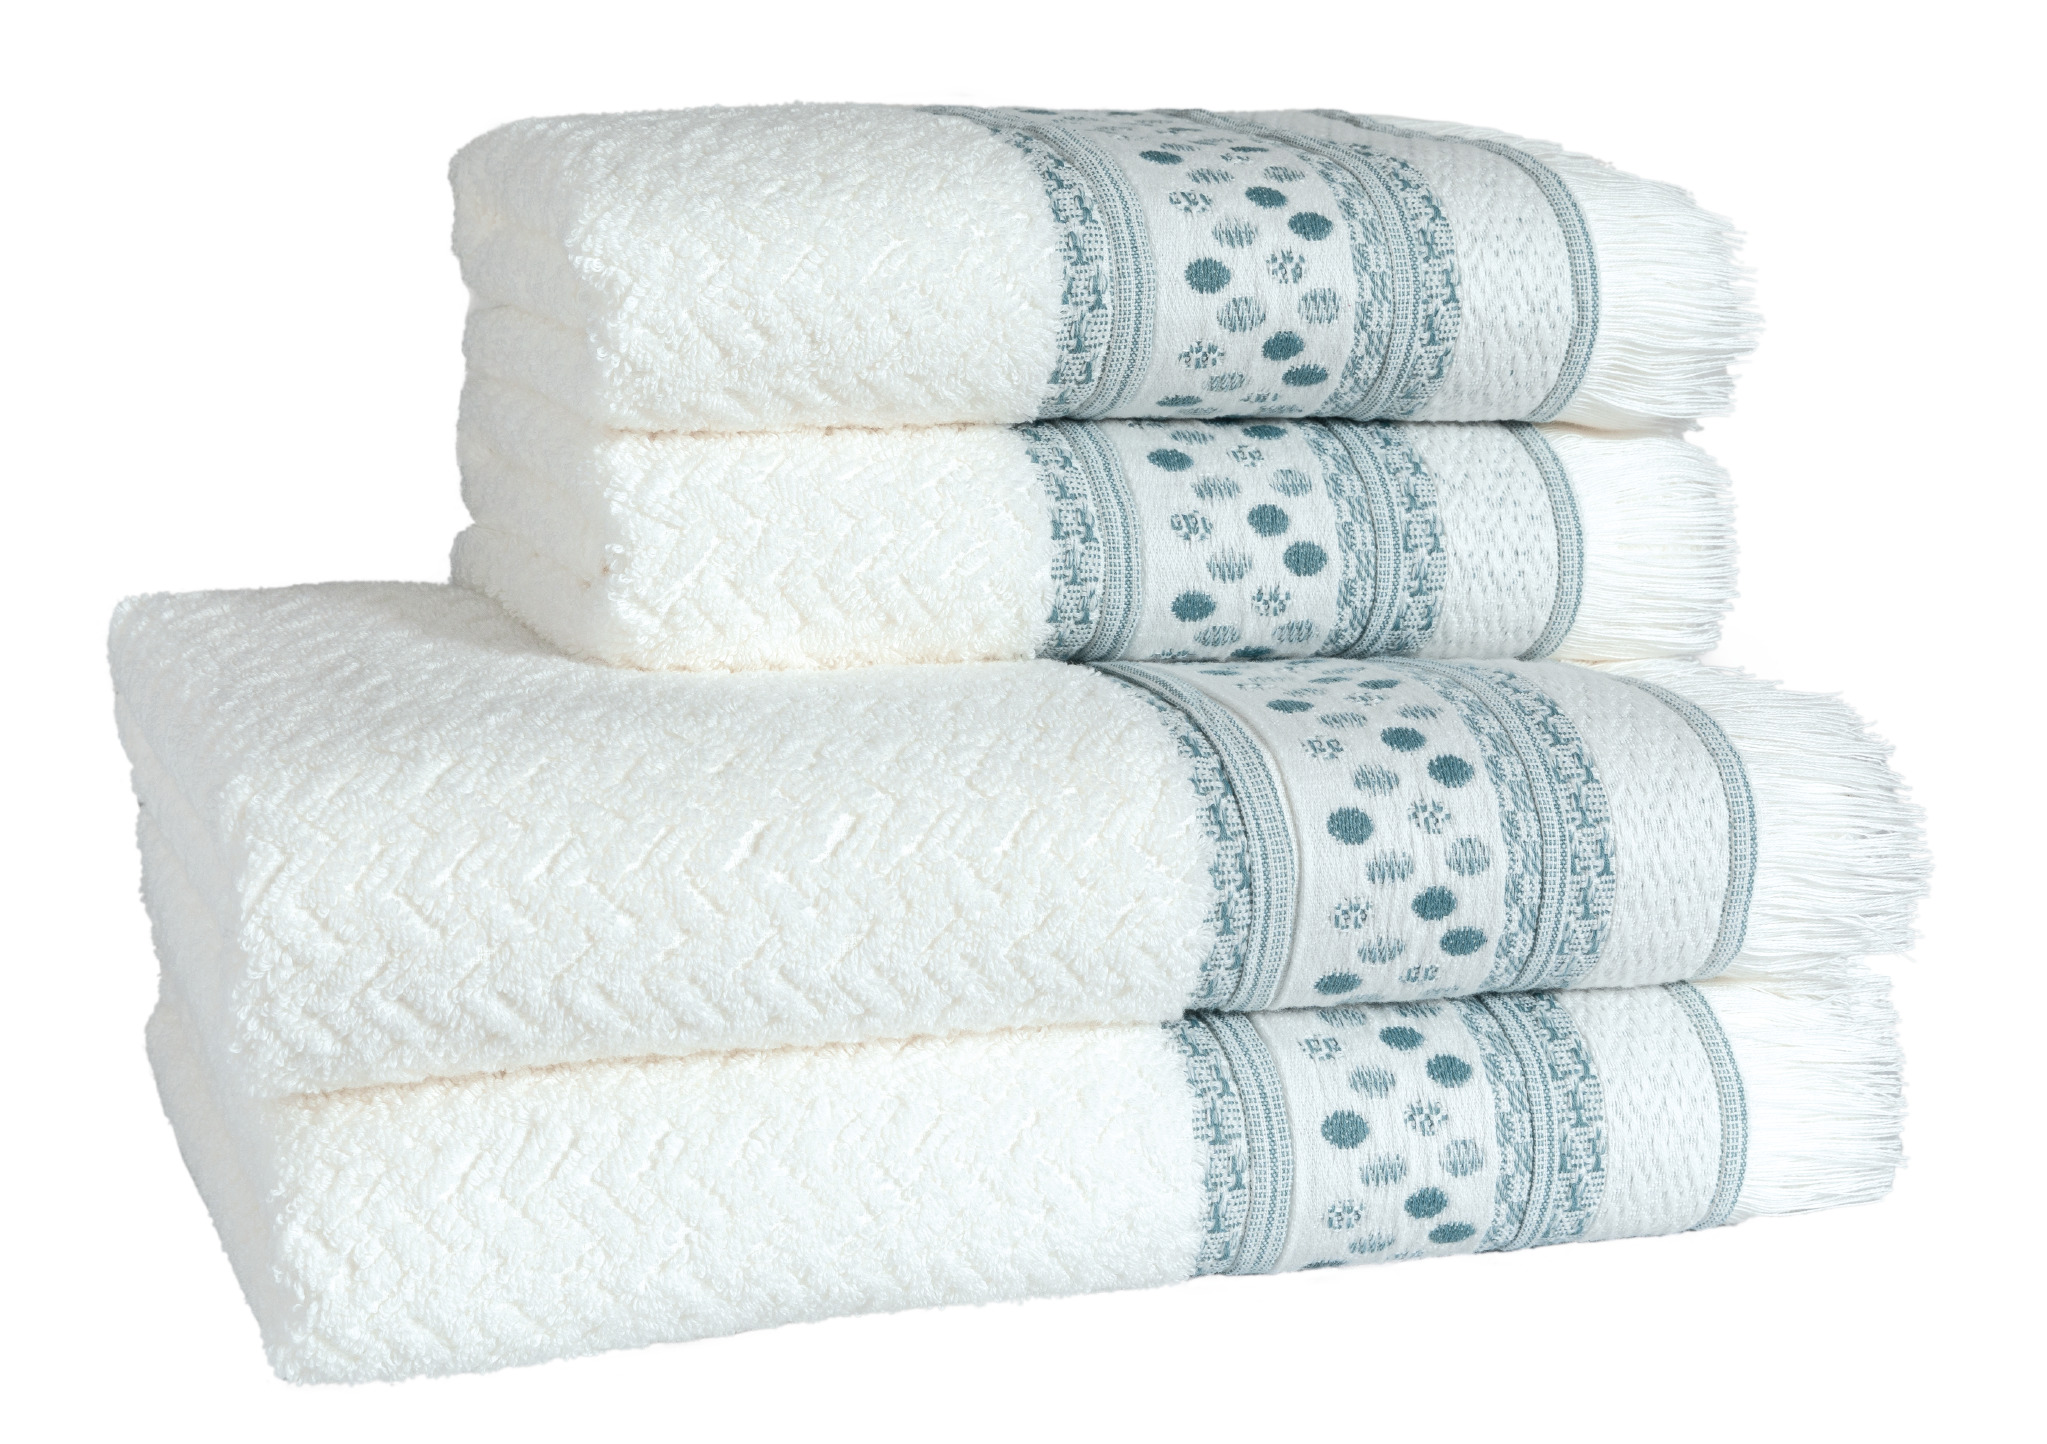 Importico - Devilla - Novo Ponto Blue Towels